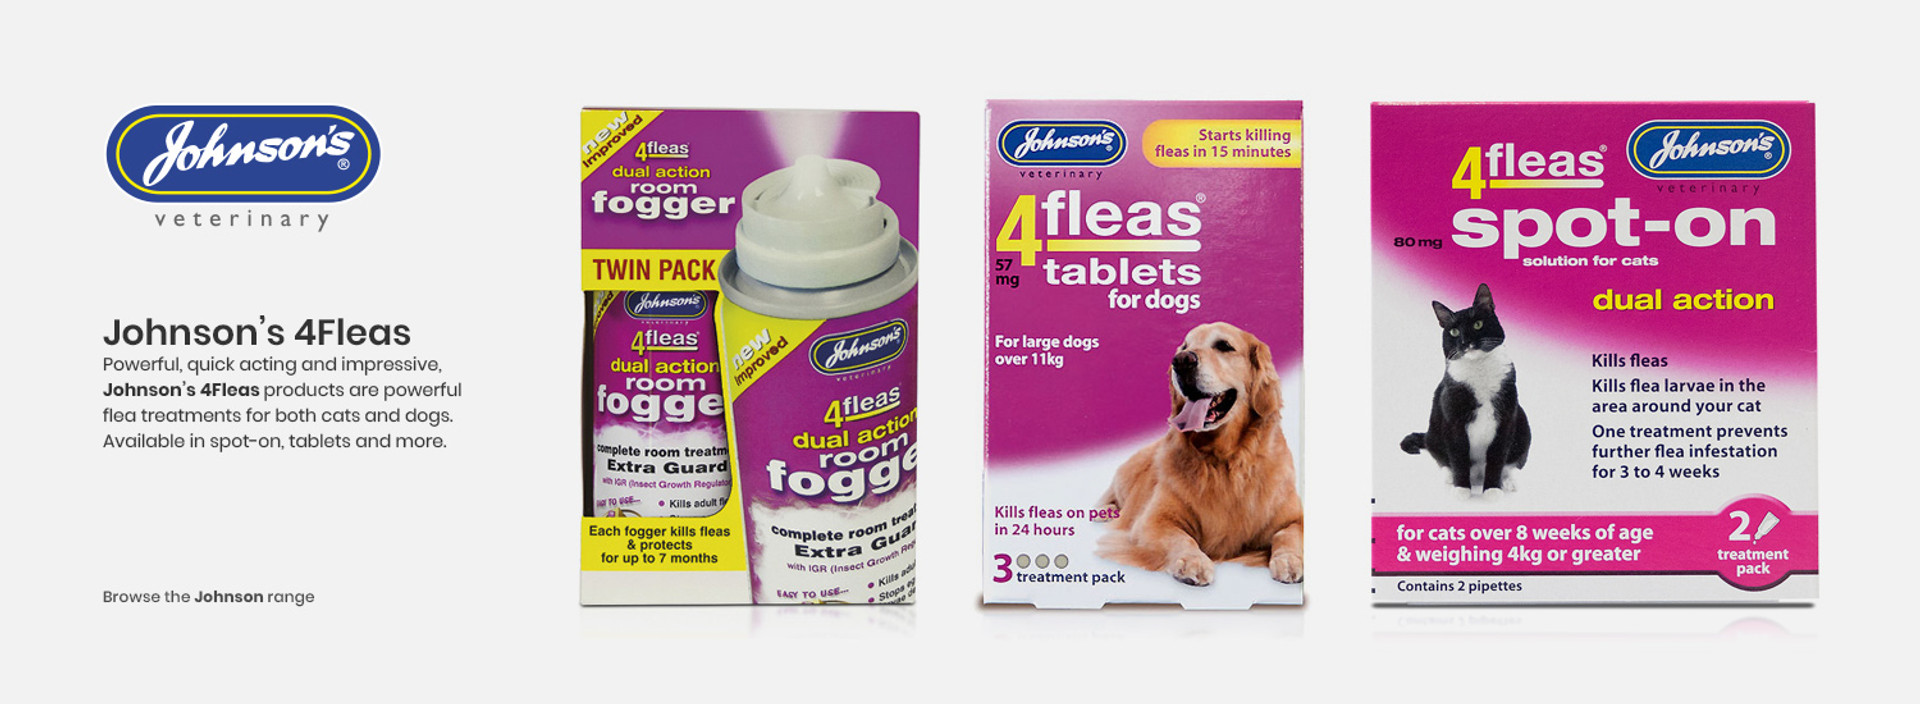 Johnsons 4fleas flea products.